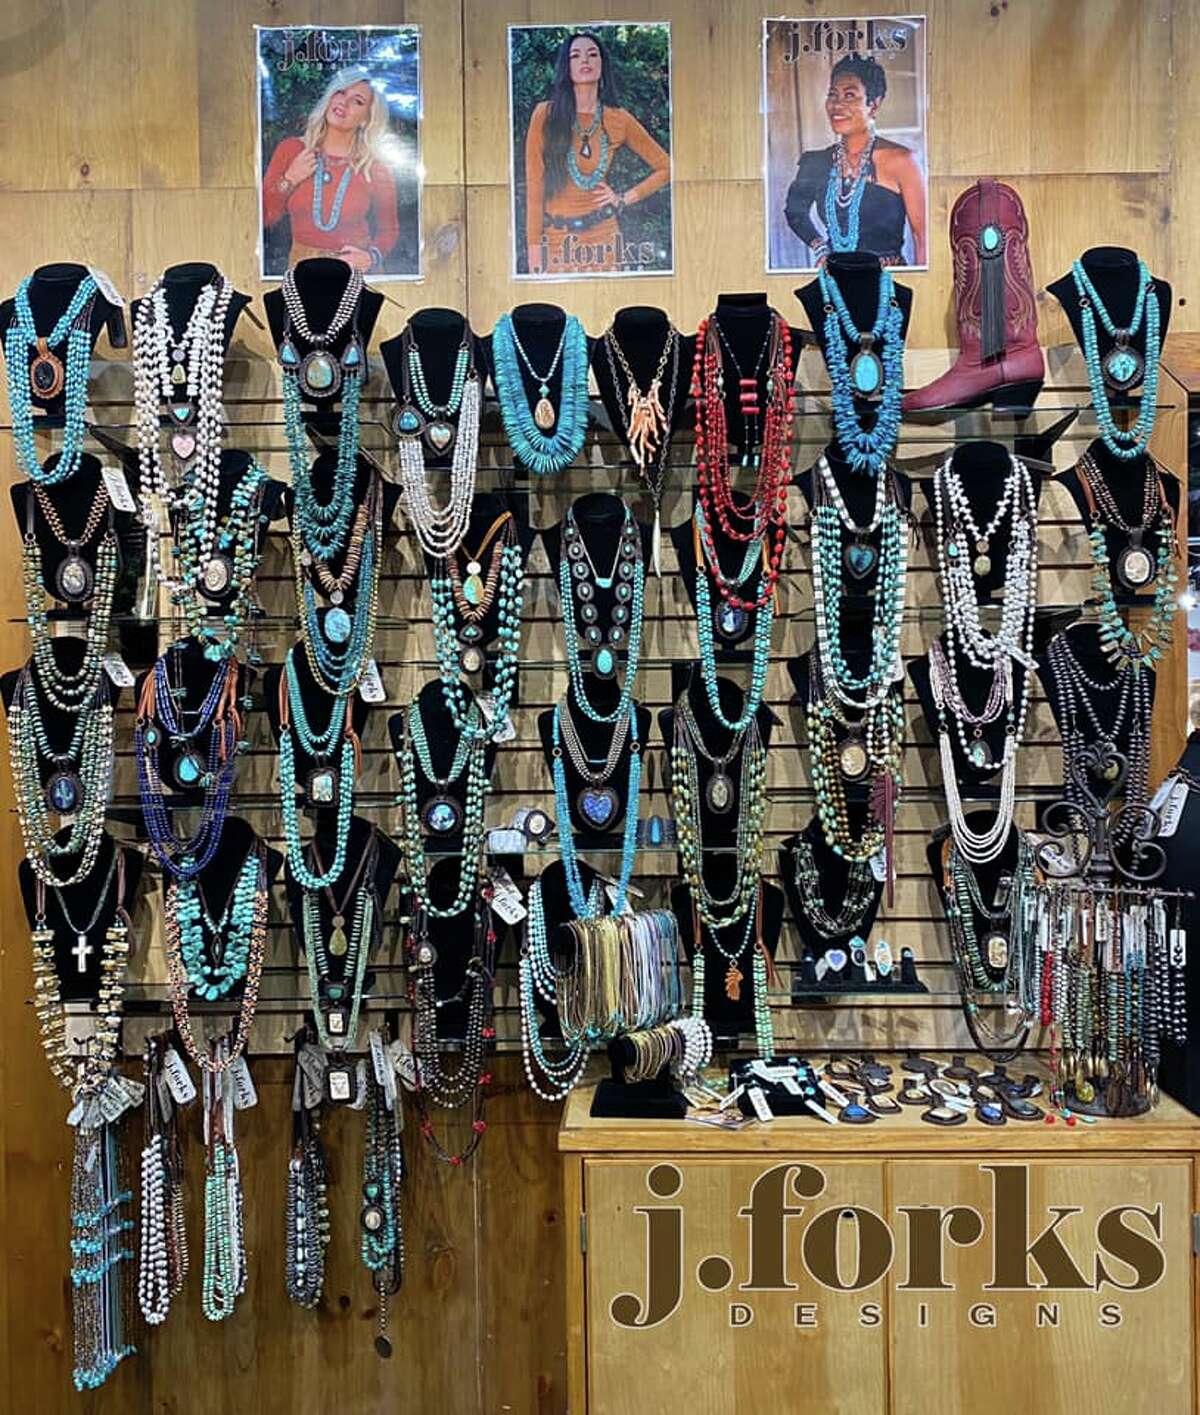 Jforks DesignsGraphic tees, jewelry Photo courtesy: Jenny Burris Ackel/Facebook